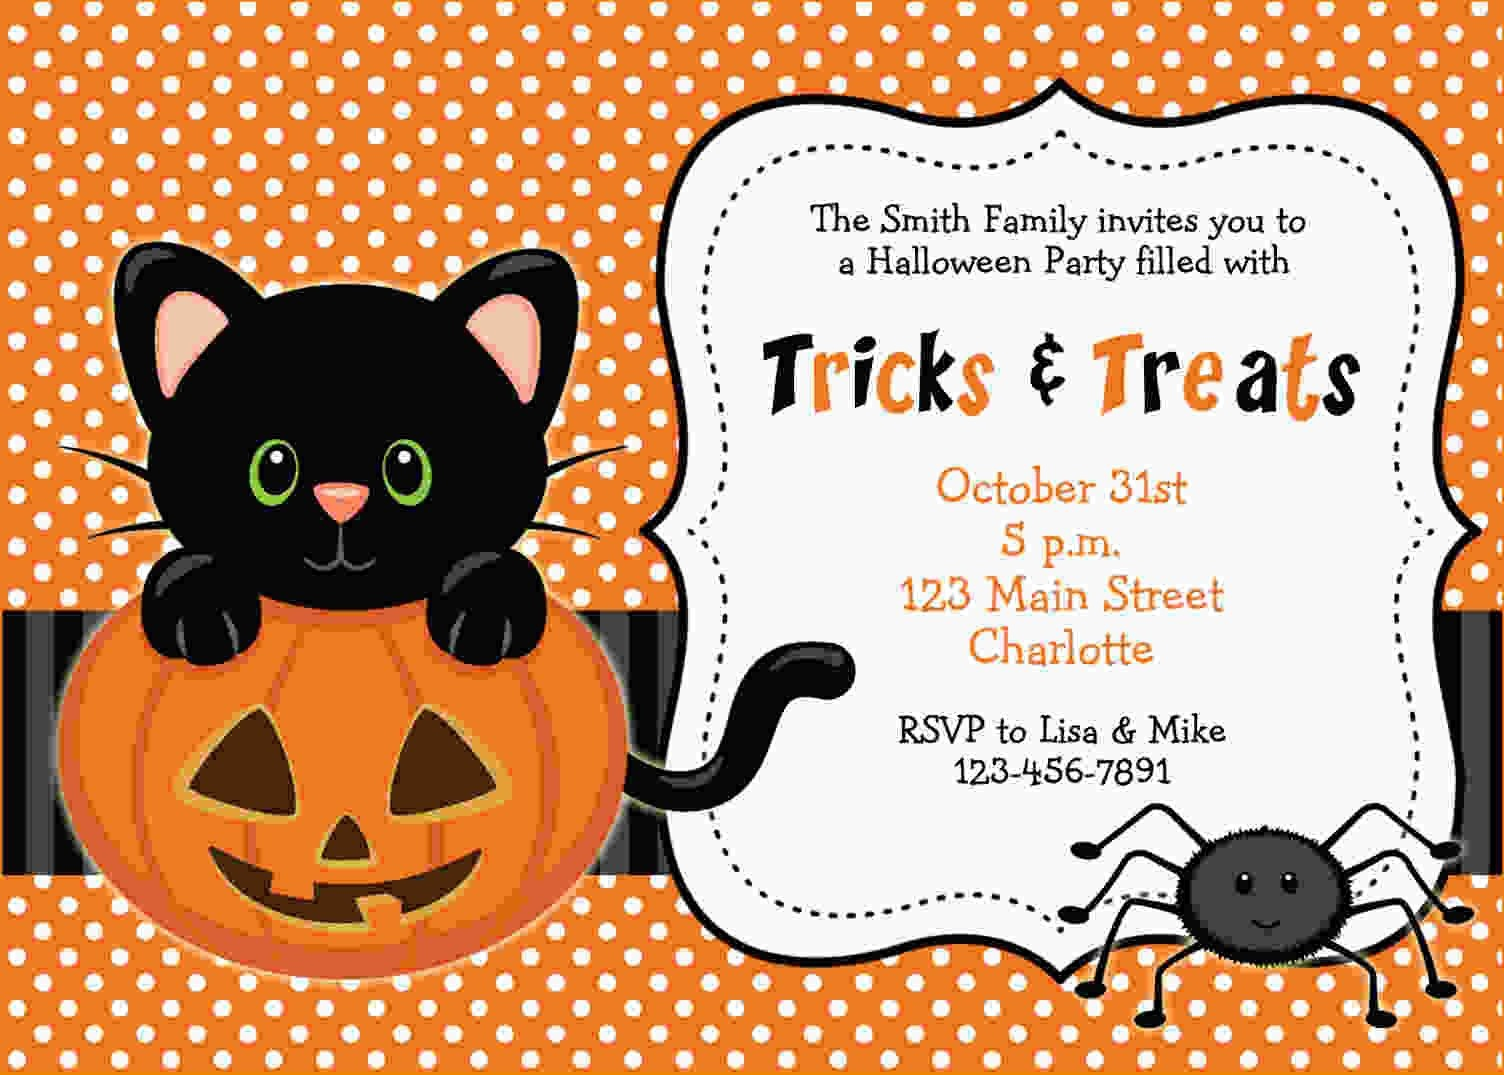 Free Printable Halloween Invitations | Free Printable Birthday - Free Online Halloween Invitations Printable